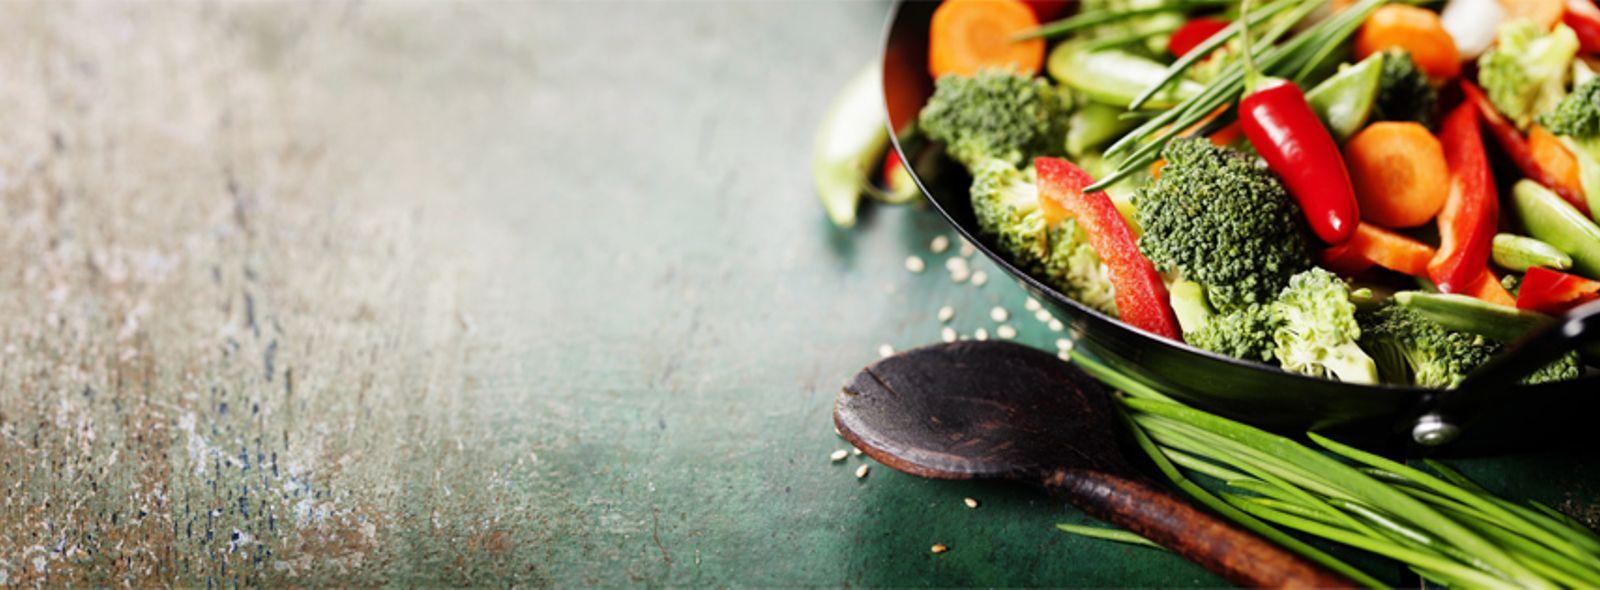 Cosa mangiano i vegetariani